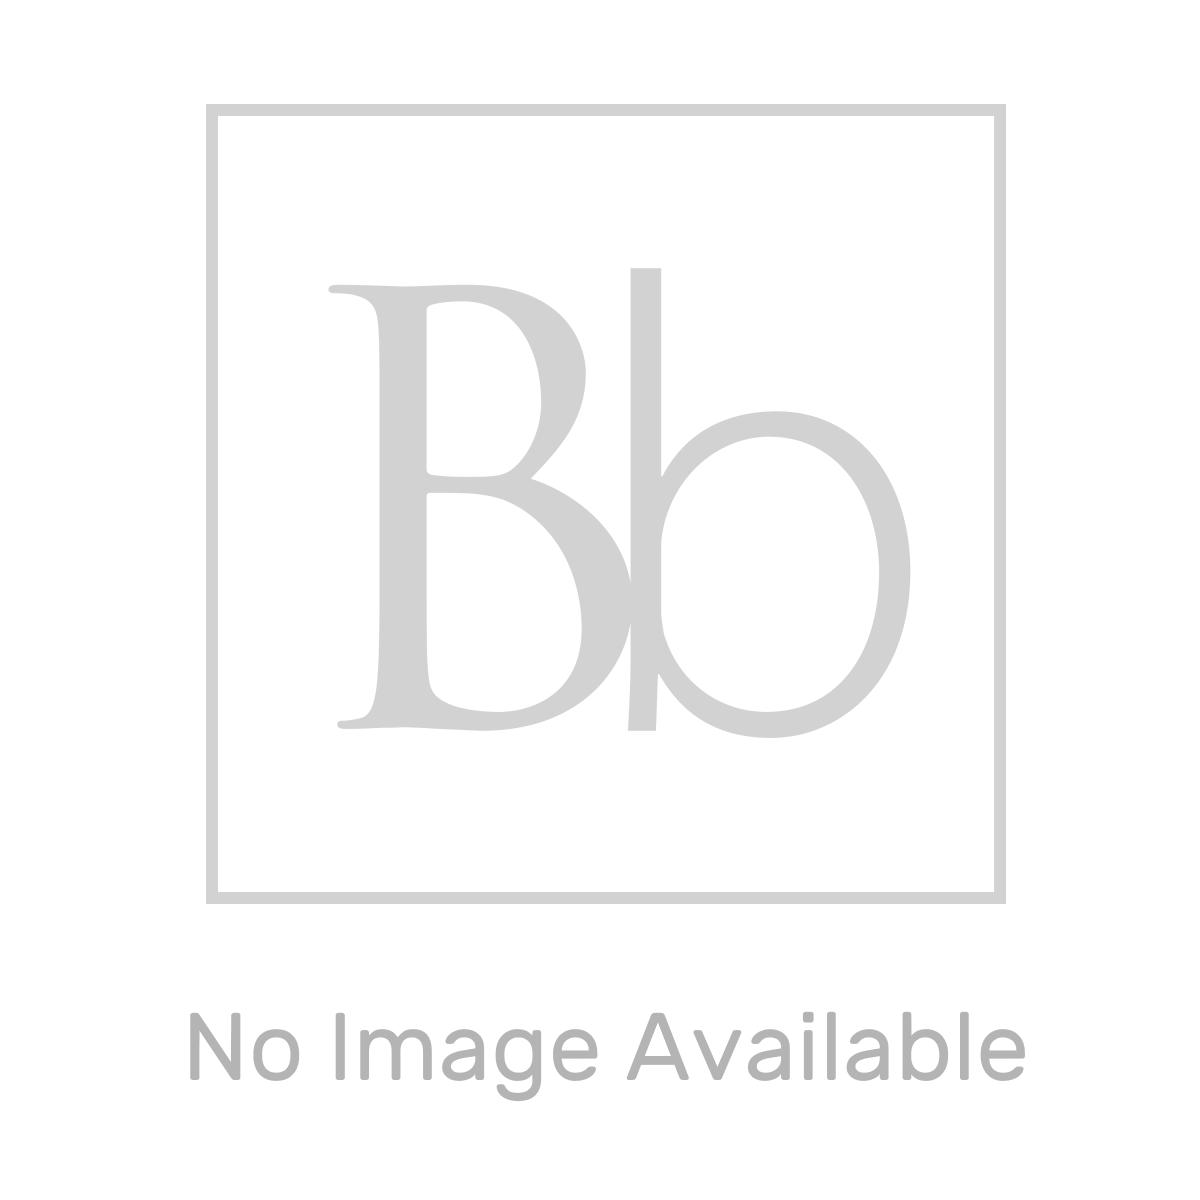 Frontline Oporto Round Single Ended Shower Bath